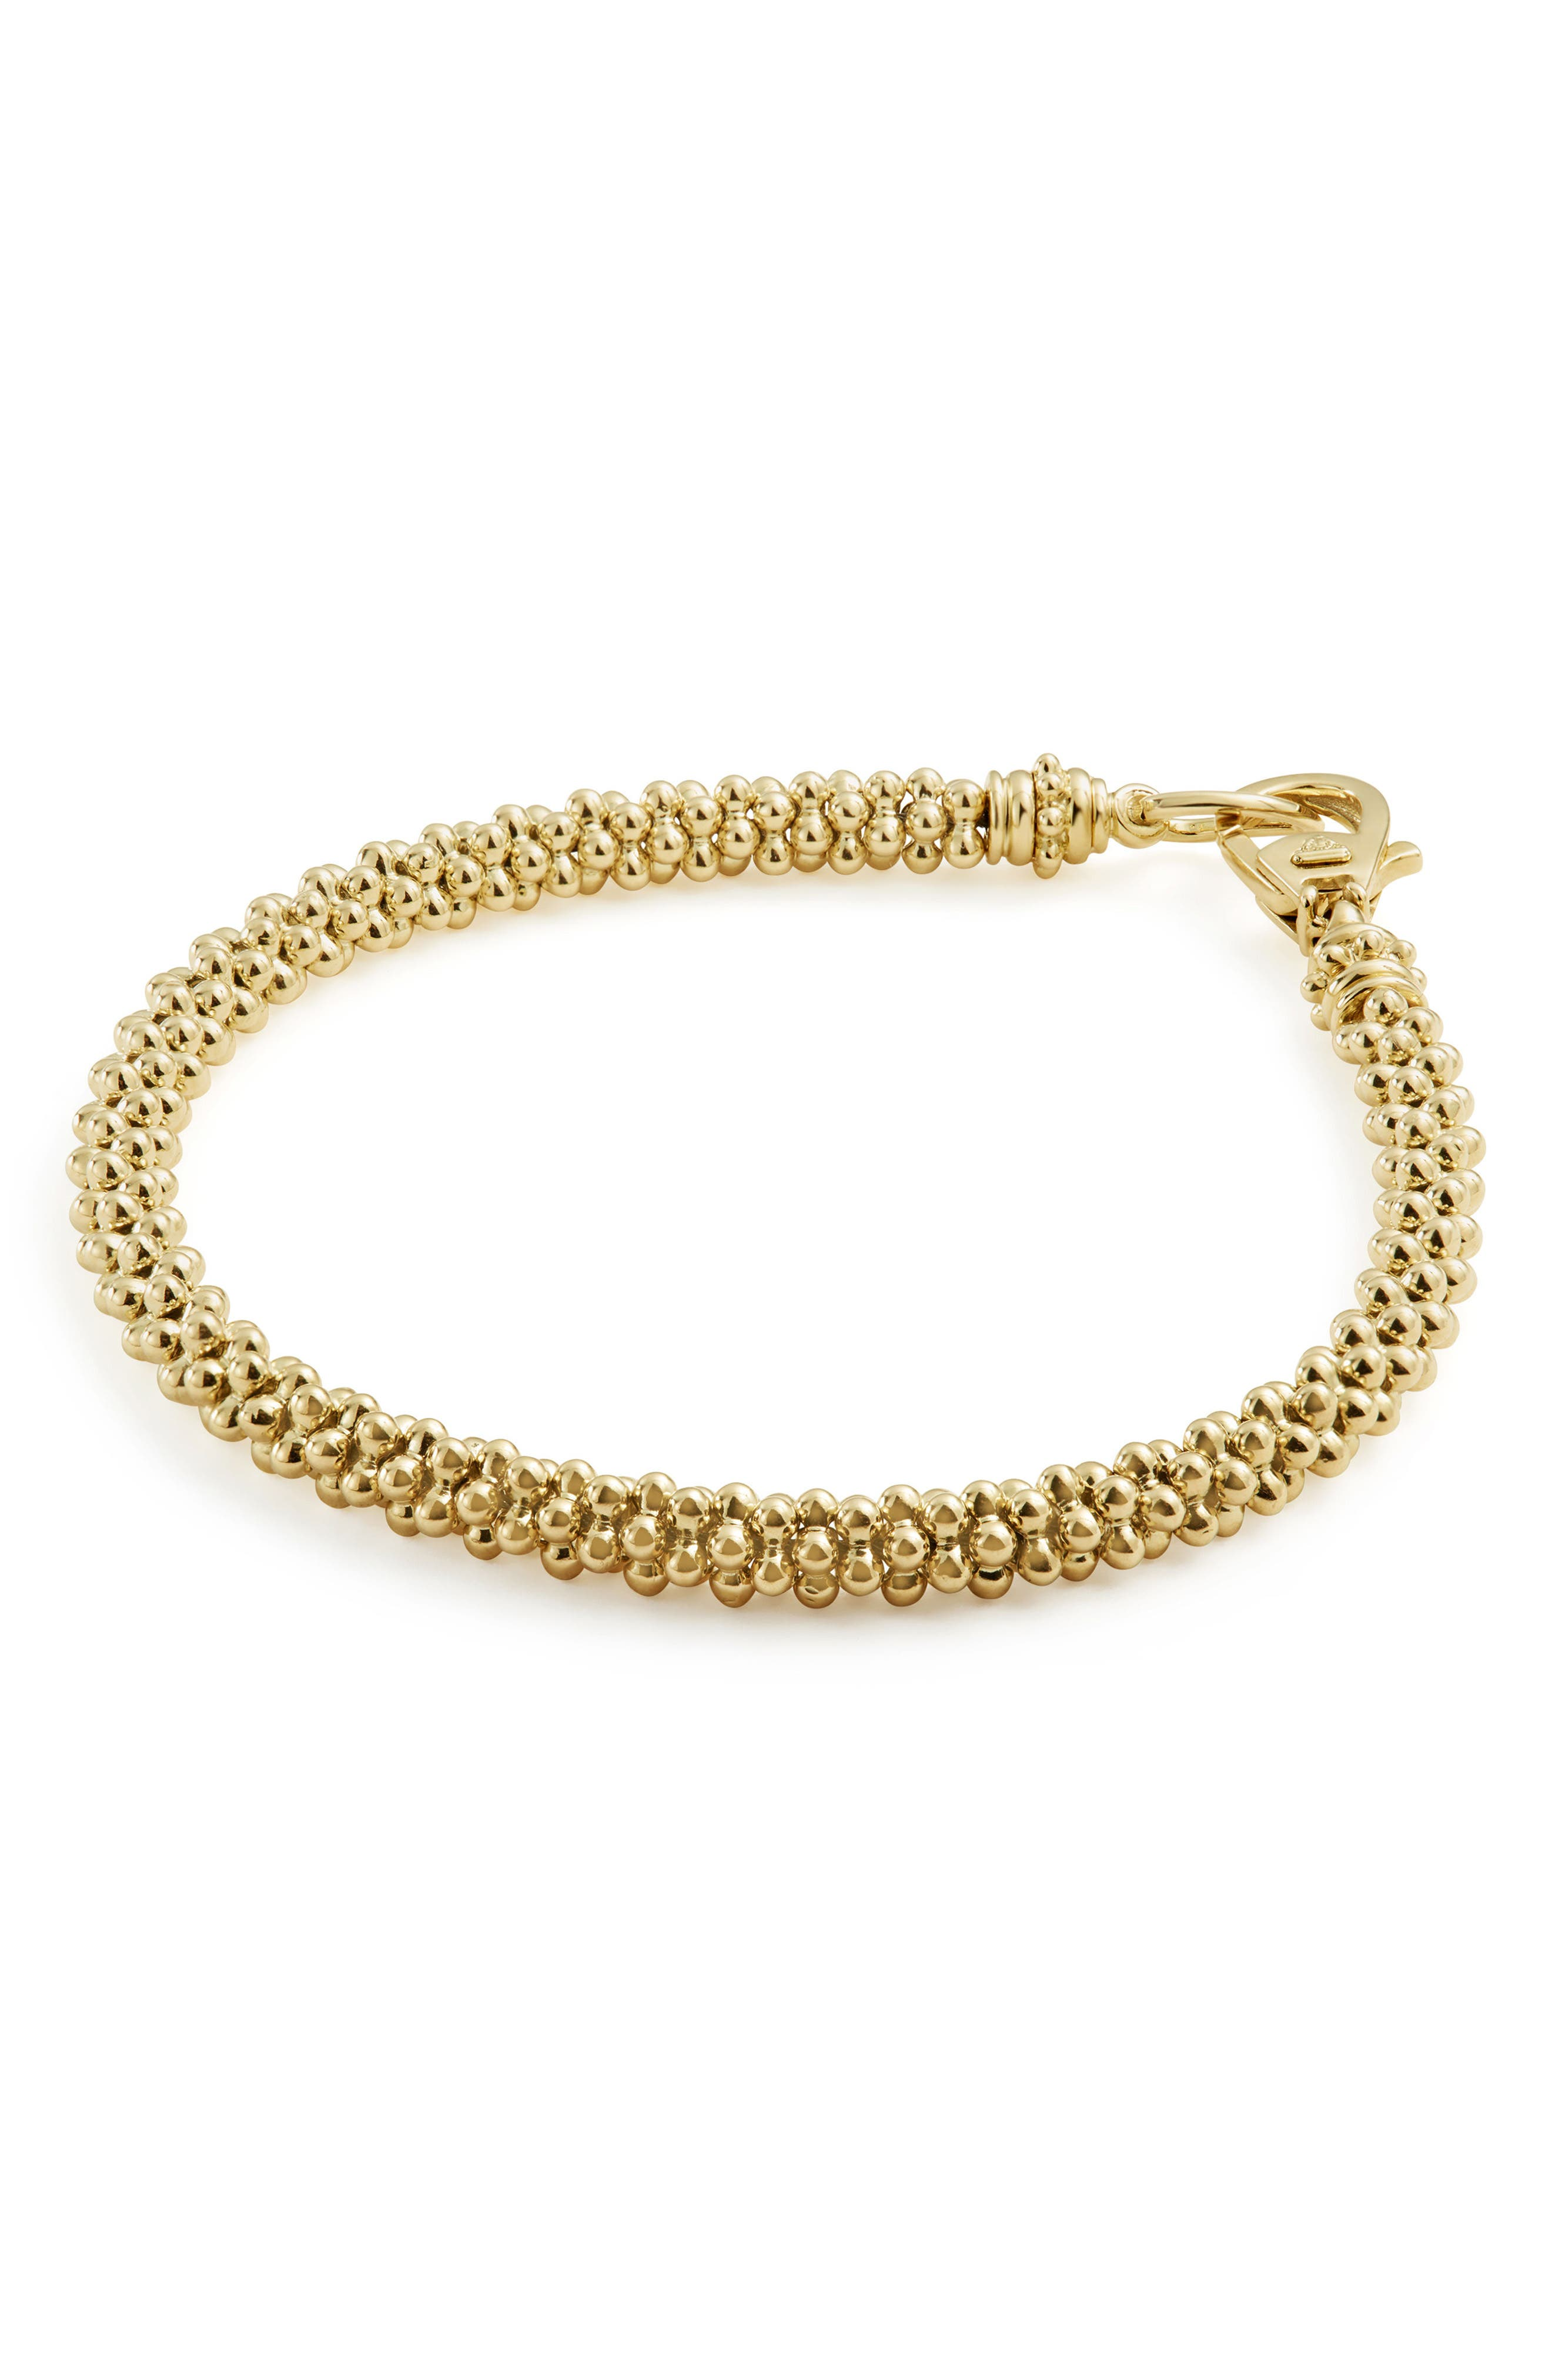 Caviar Gold Rope Bracelet,                             Alternate thumbnail 4, color,                             Gold